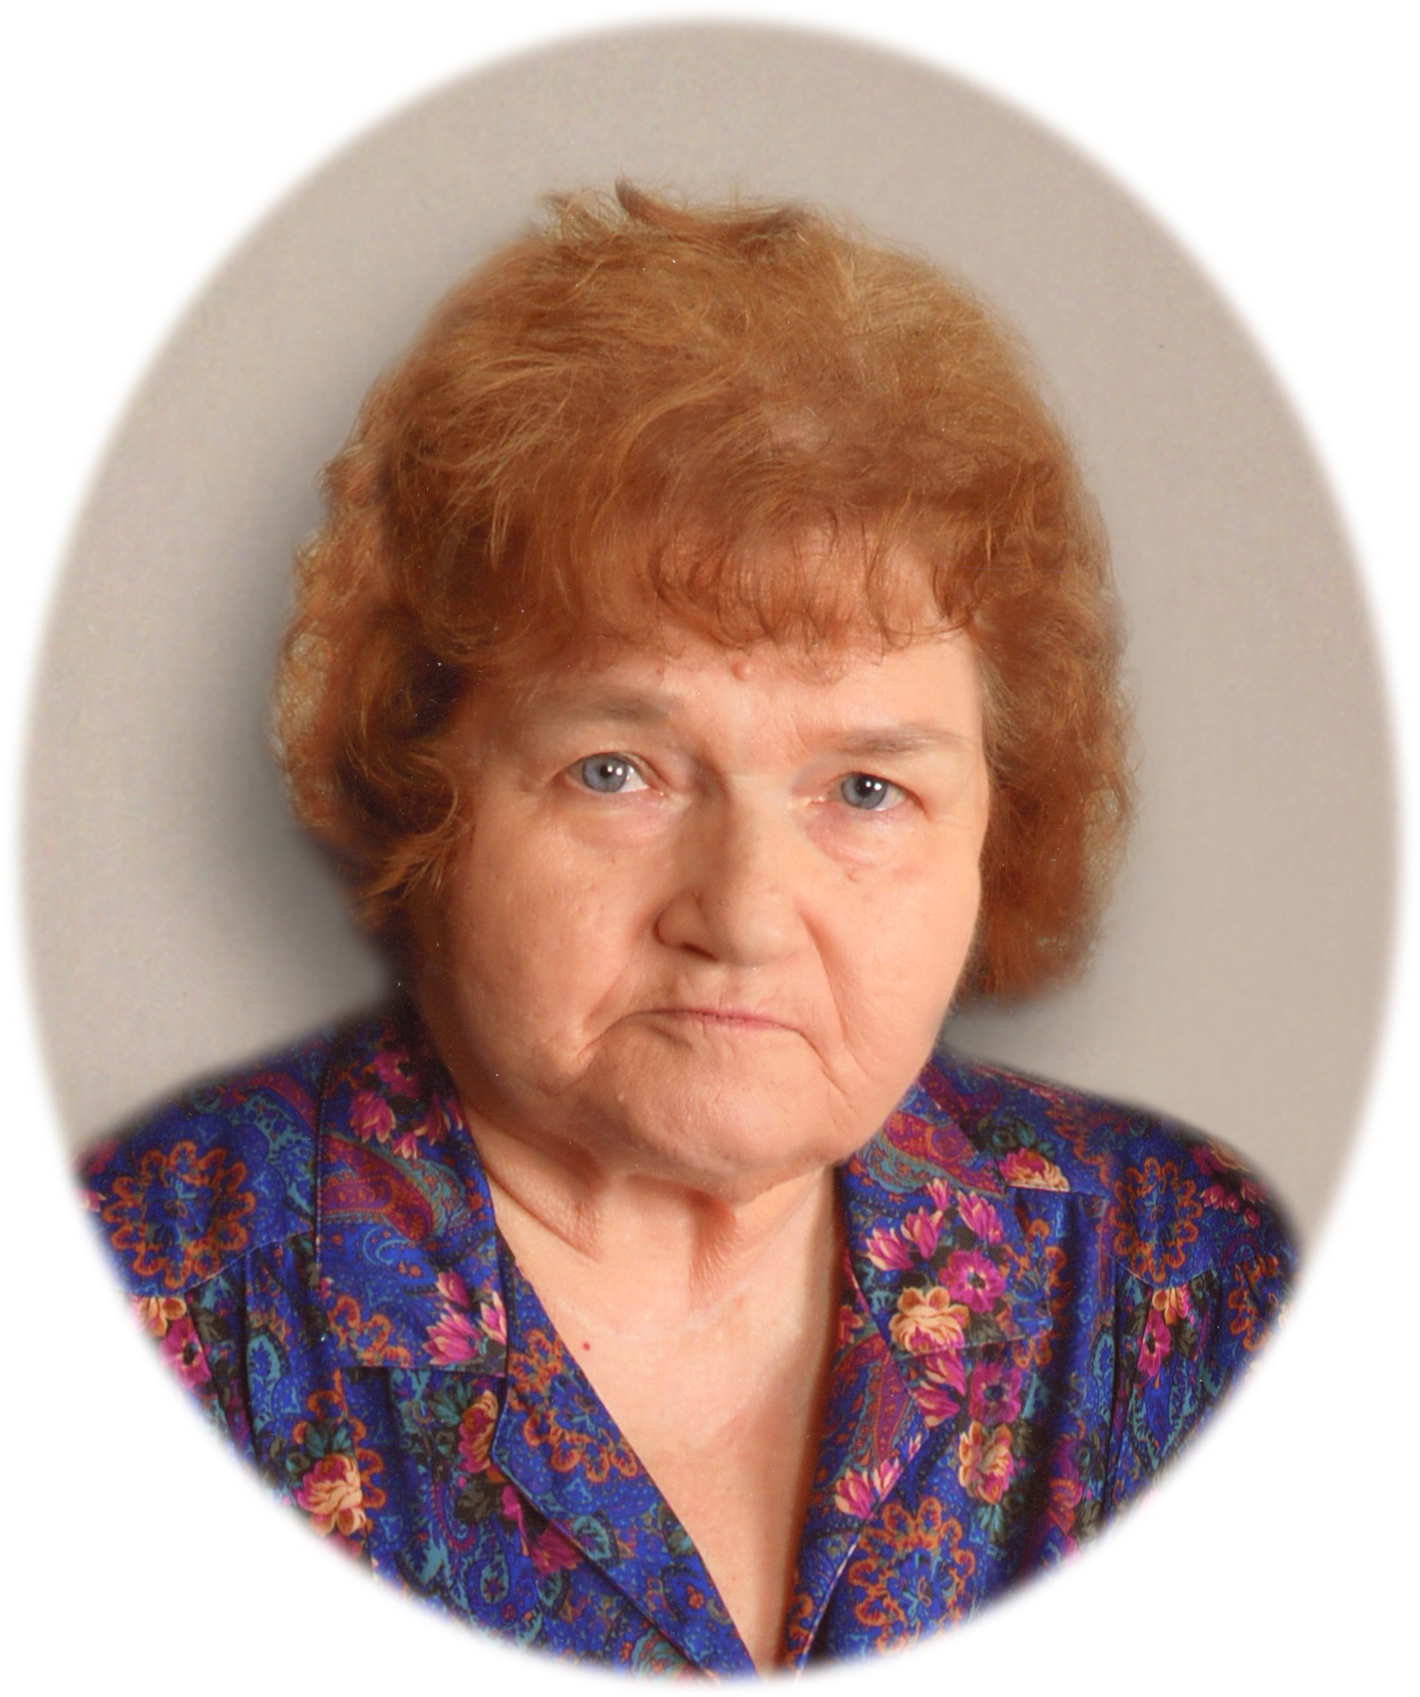 Vicky Lee Hoerman